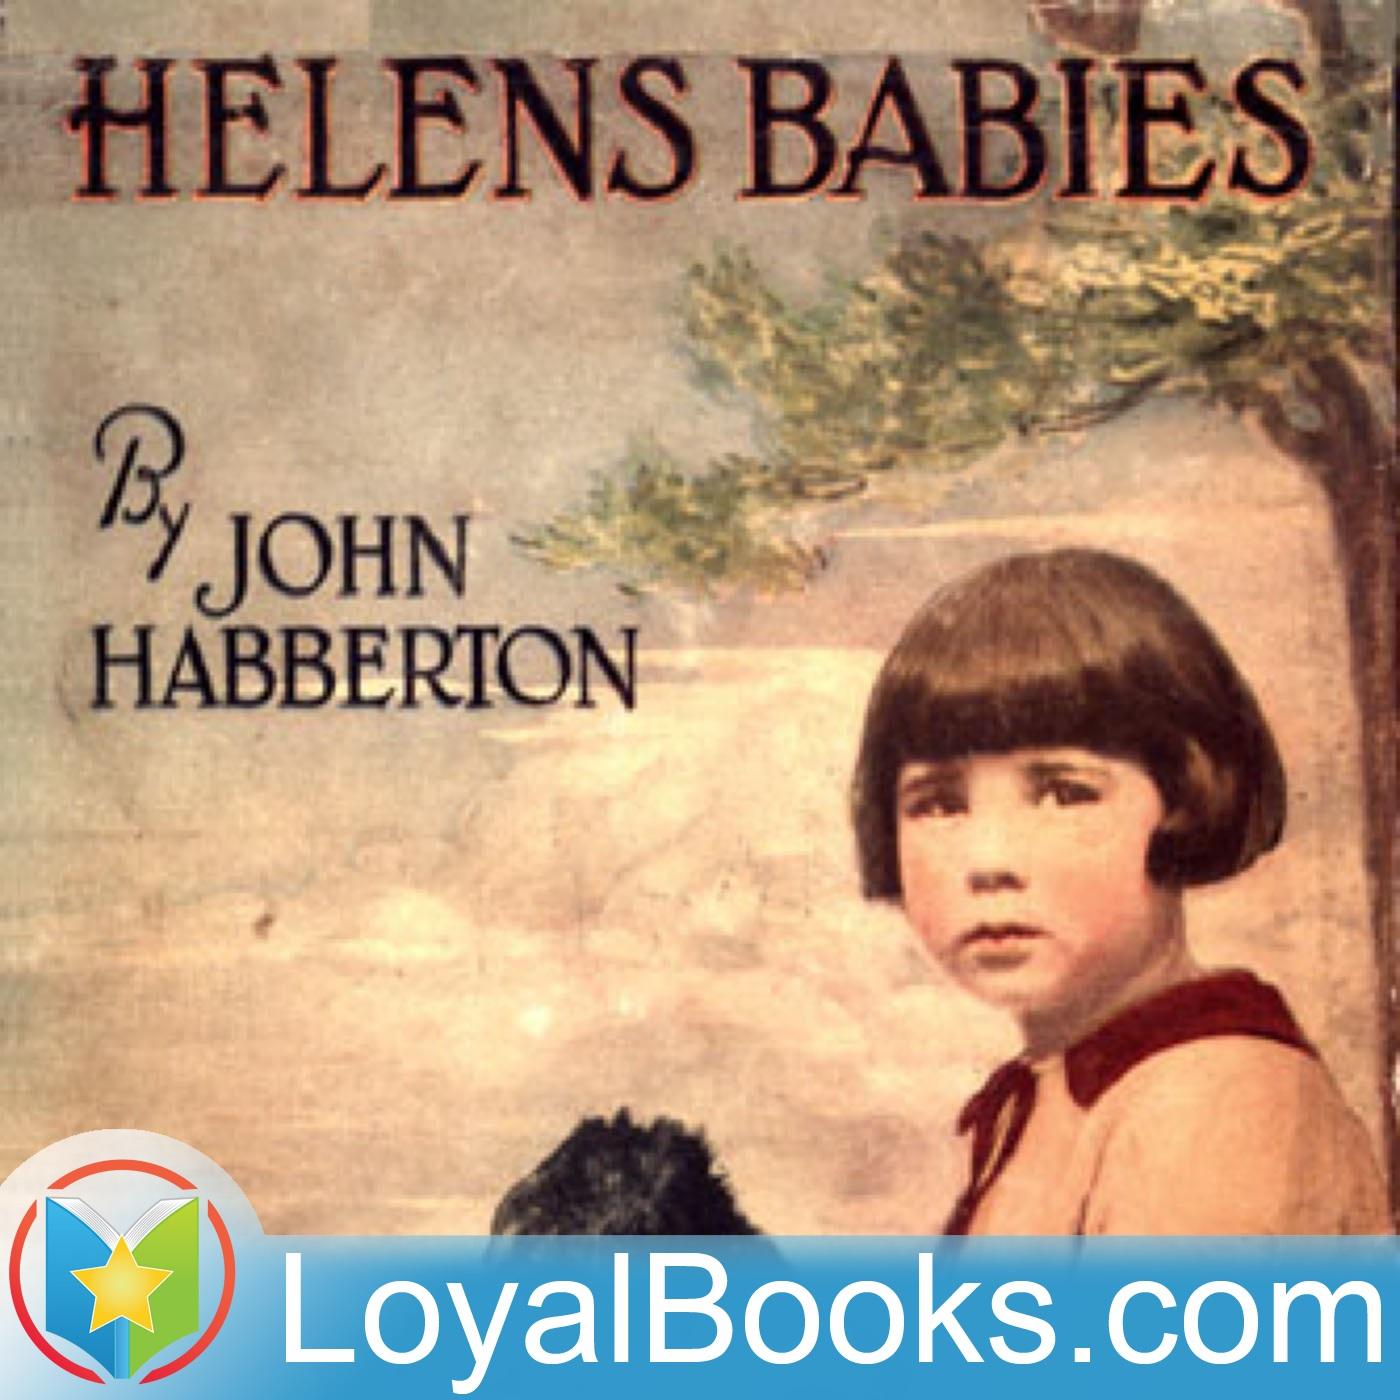 <![CDATA[Helen's Babies by John Habberton]]>